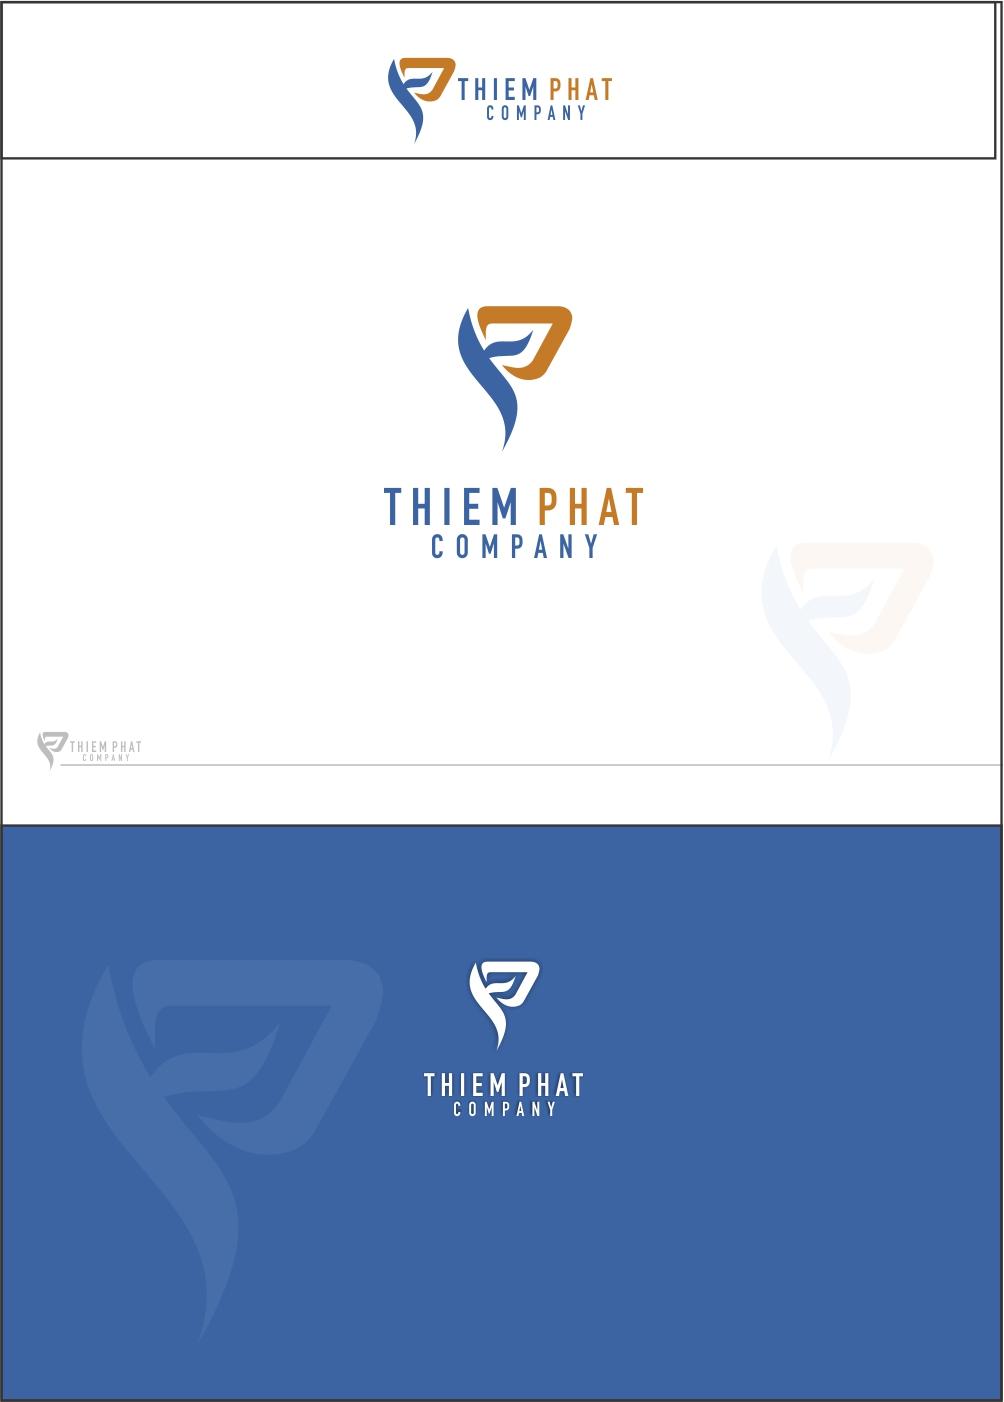 Logo Design by ian69 - Entry No. 89 in the Logo Design Contest New Logo Design for Thiem Phat company.